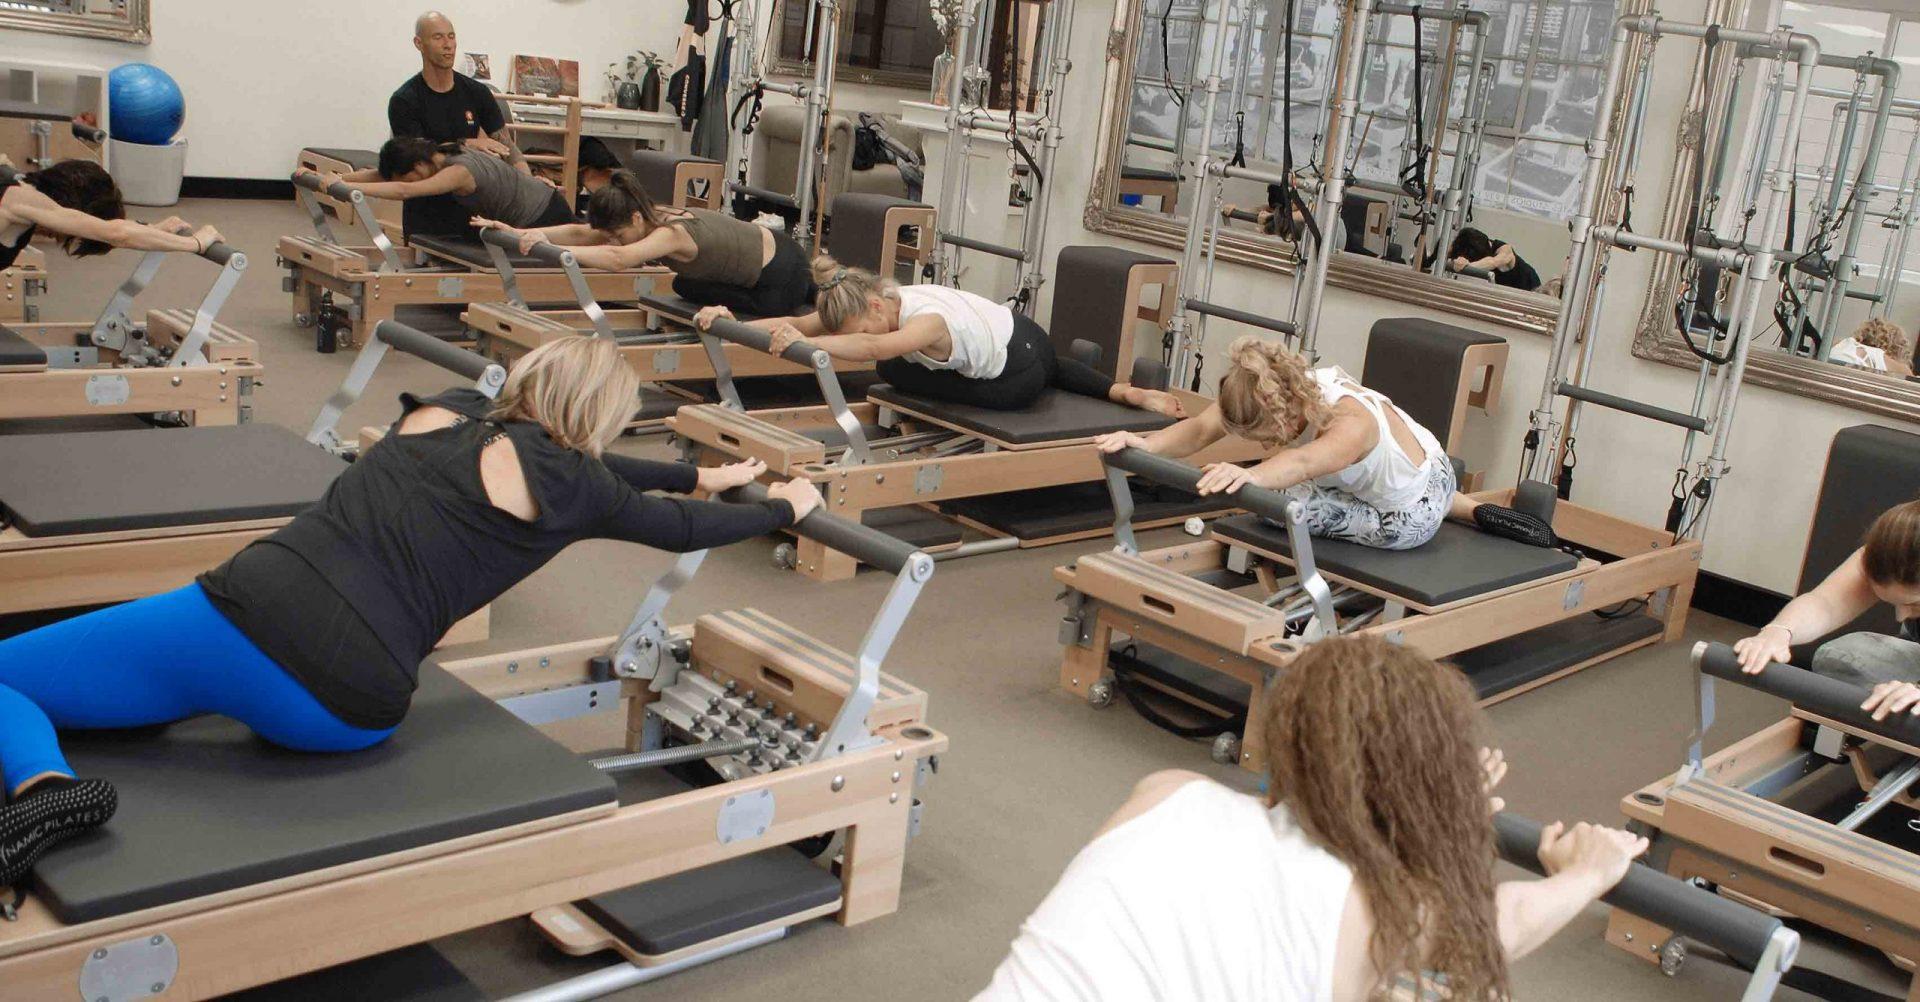 Dynamic Pilates Reformer Beginners Class